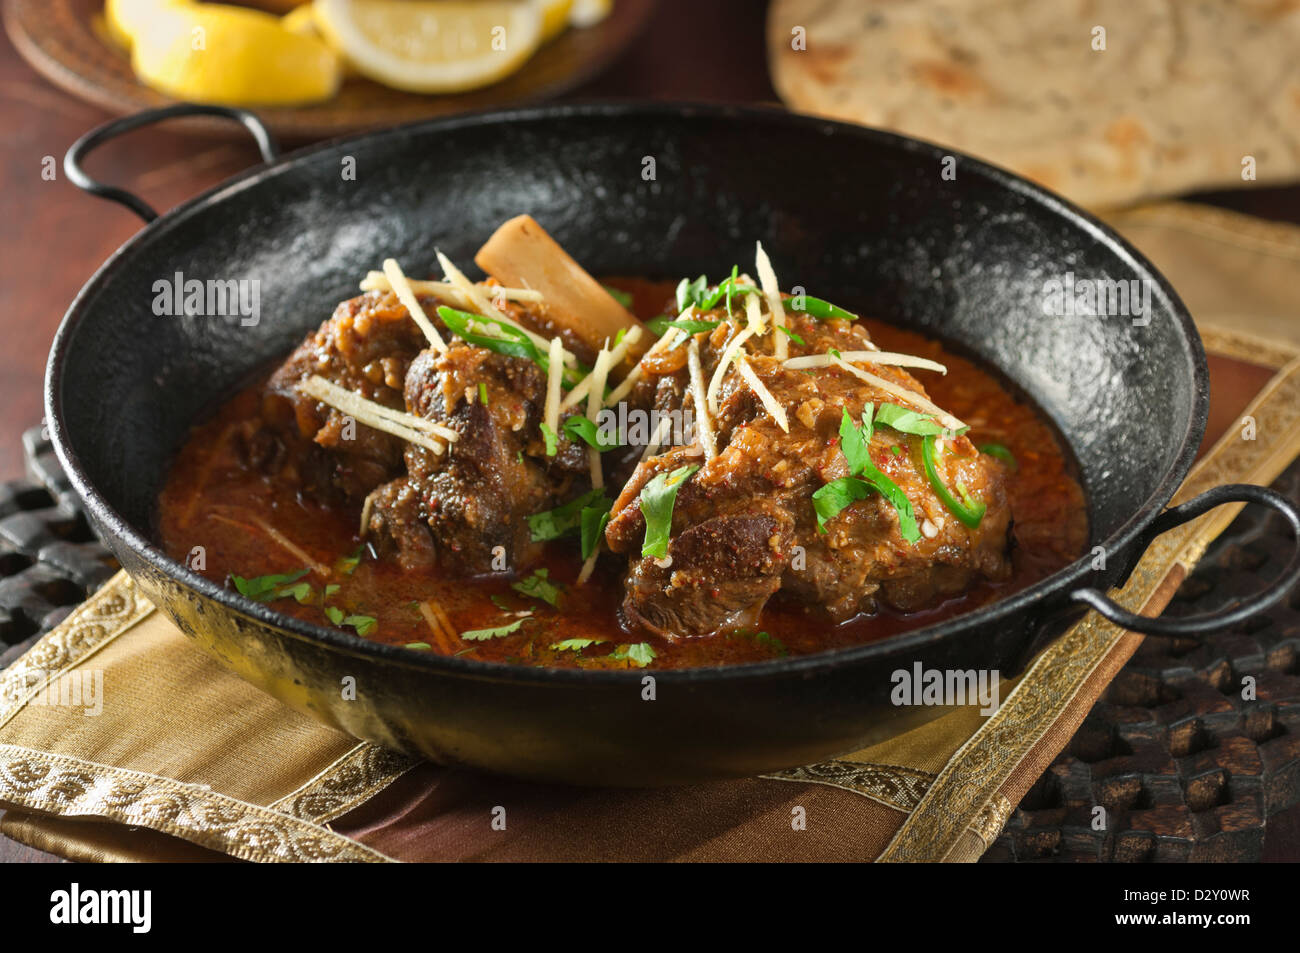 Lamb Nihari Pakistan India Bangladesh Food - Stock Image